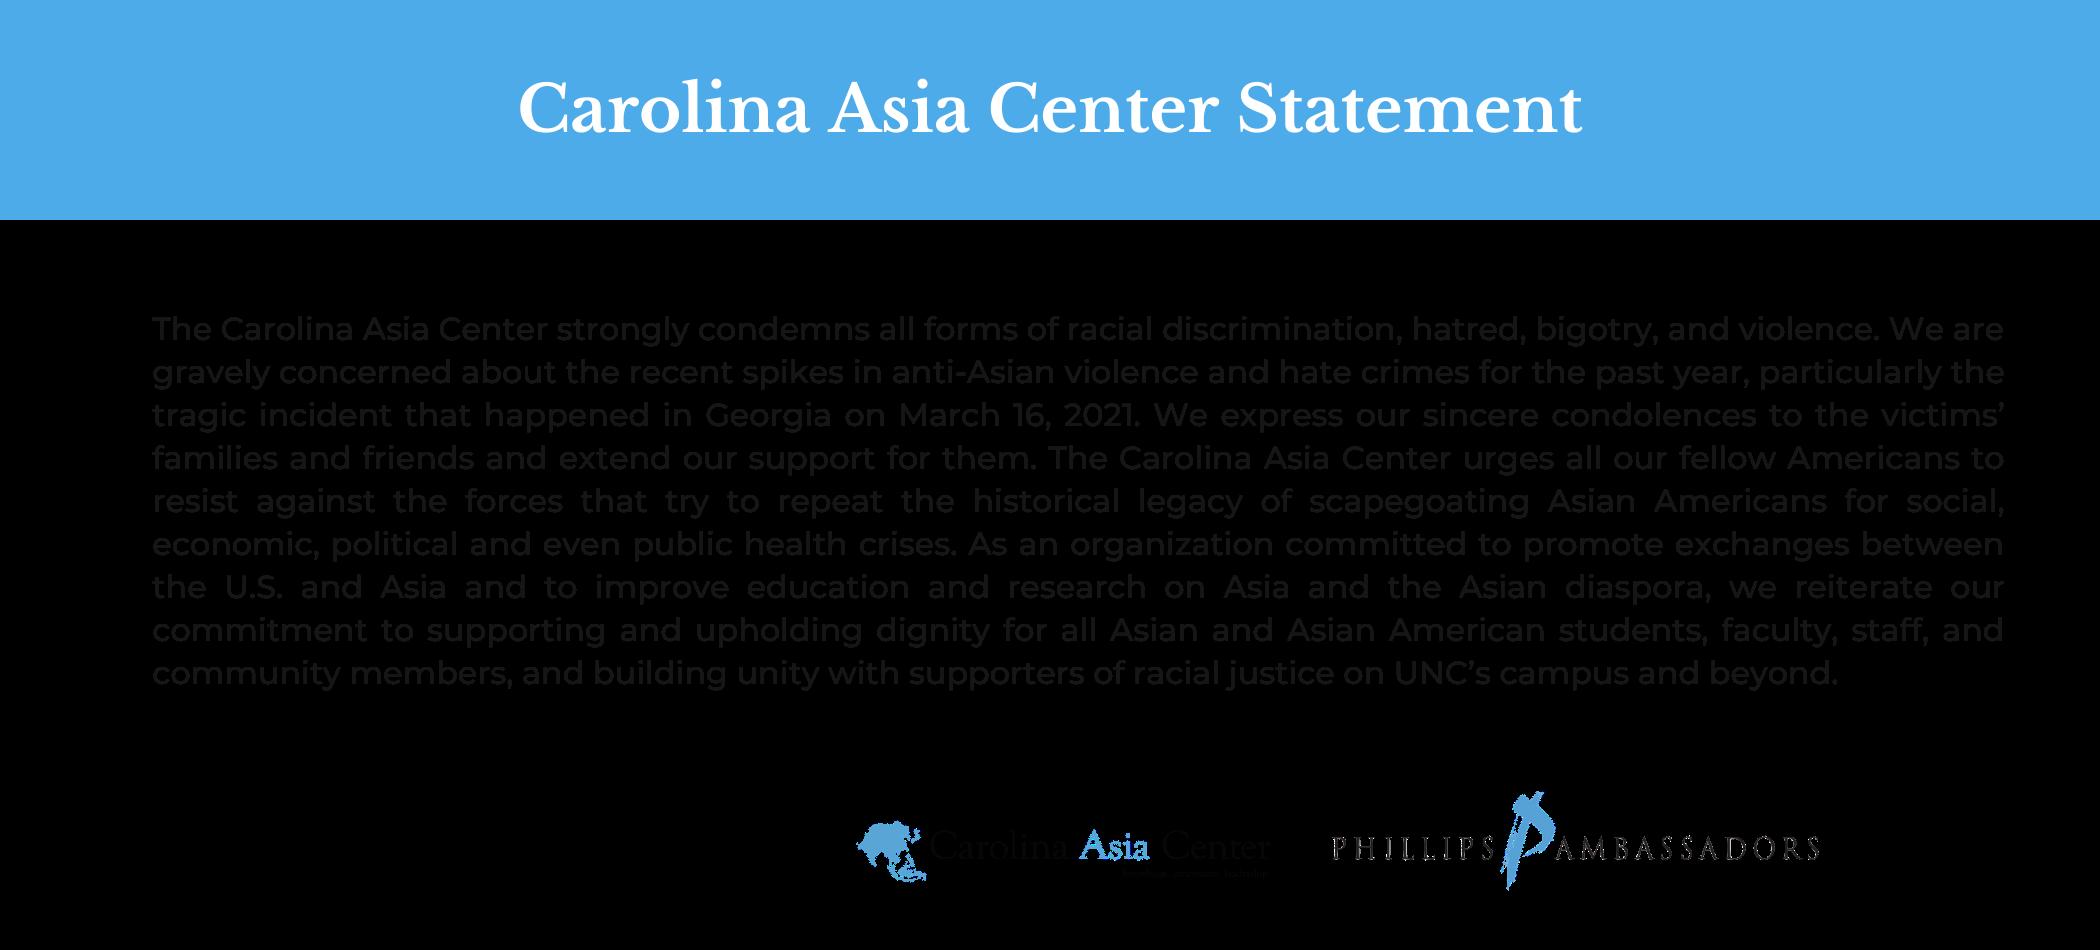 Statement on Violence